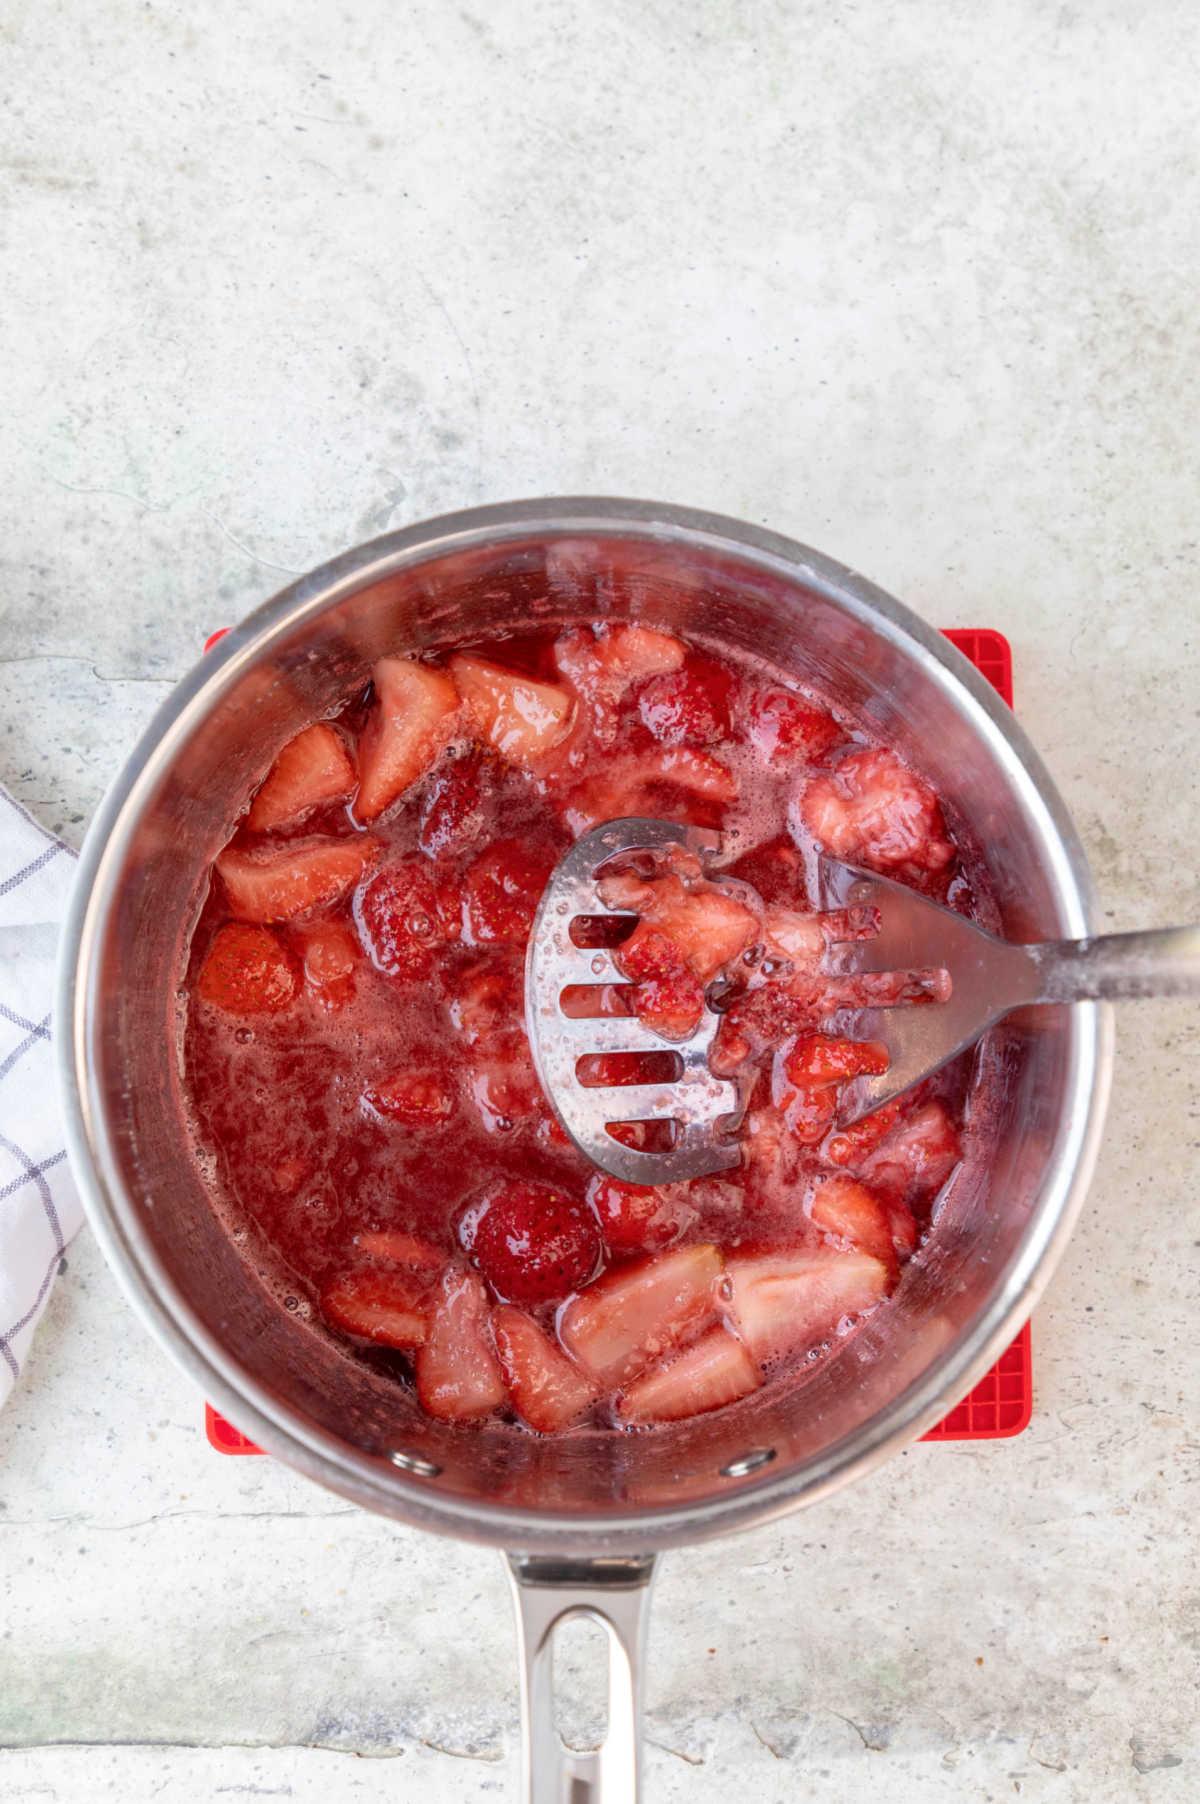 A potato masher mashing strawberries in a saucepan.